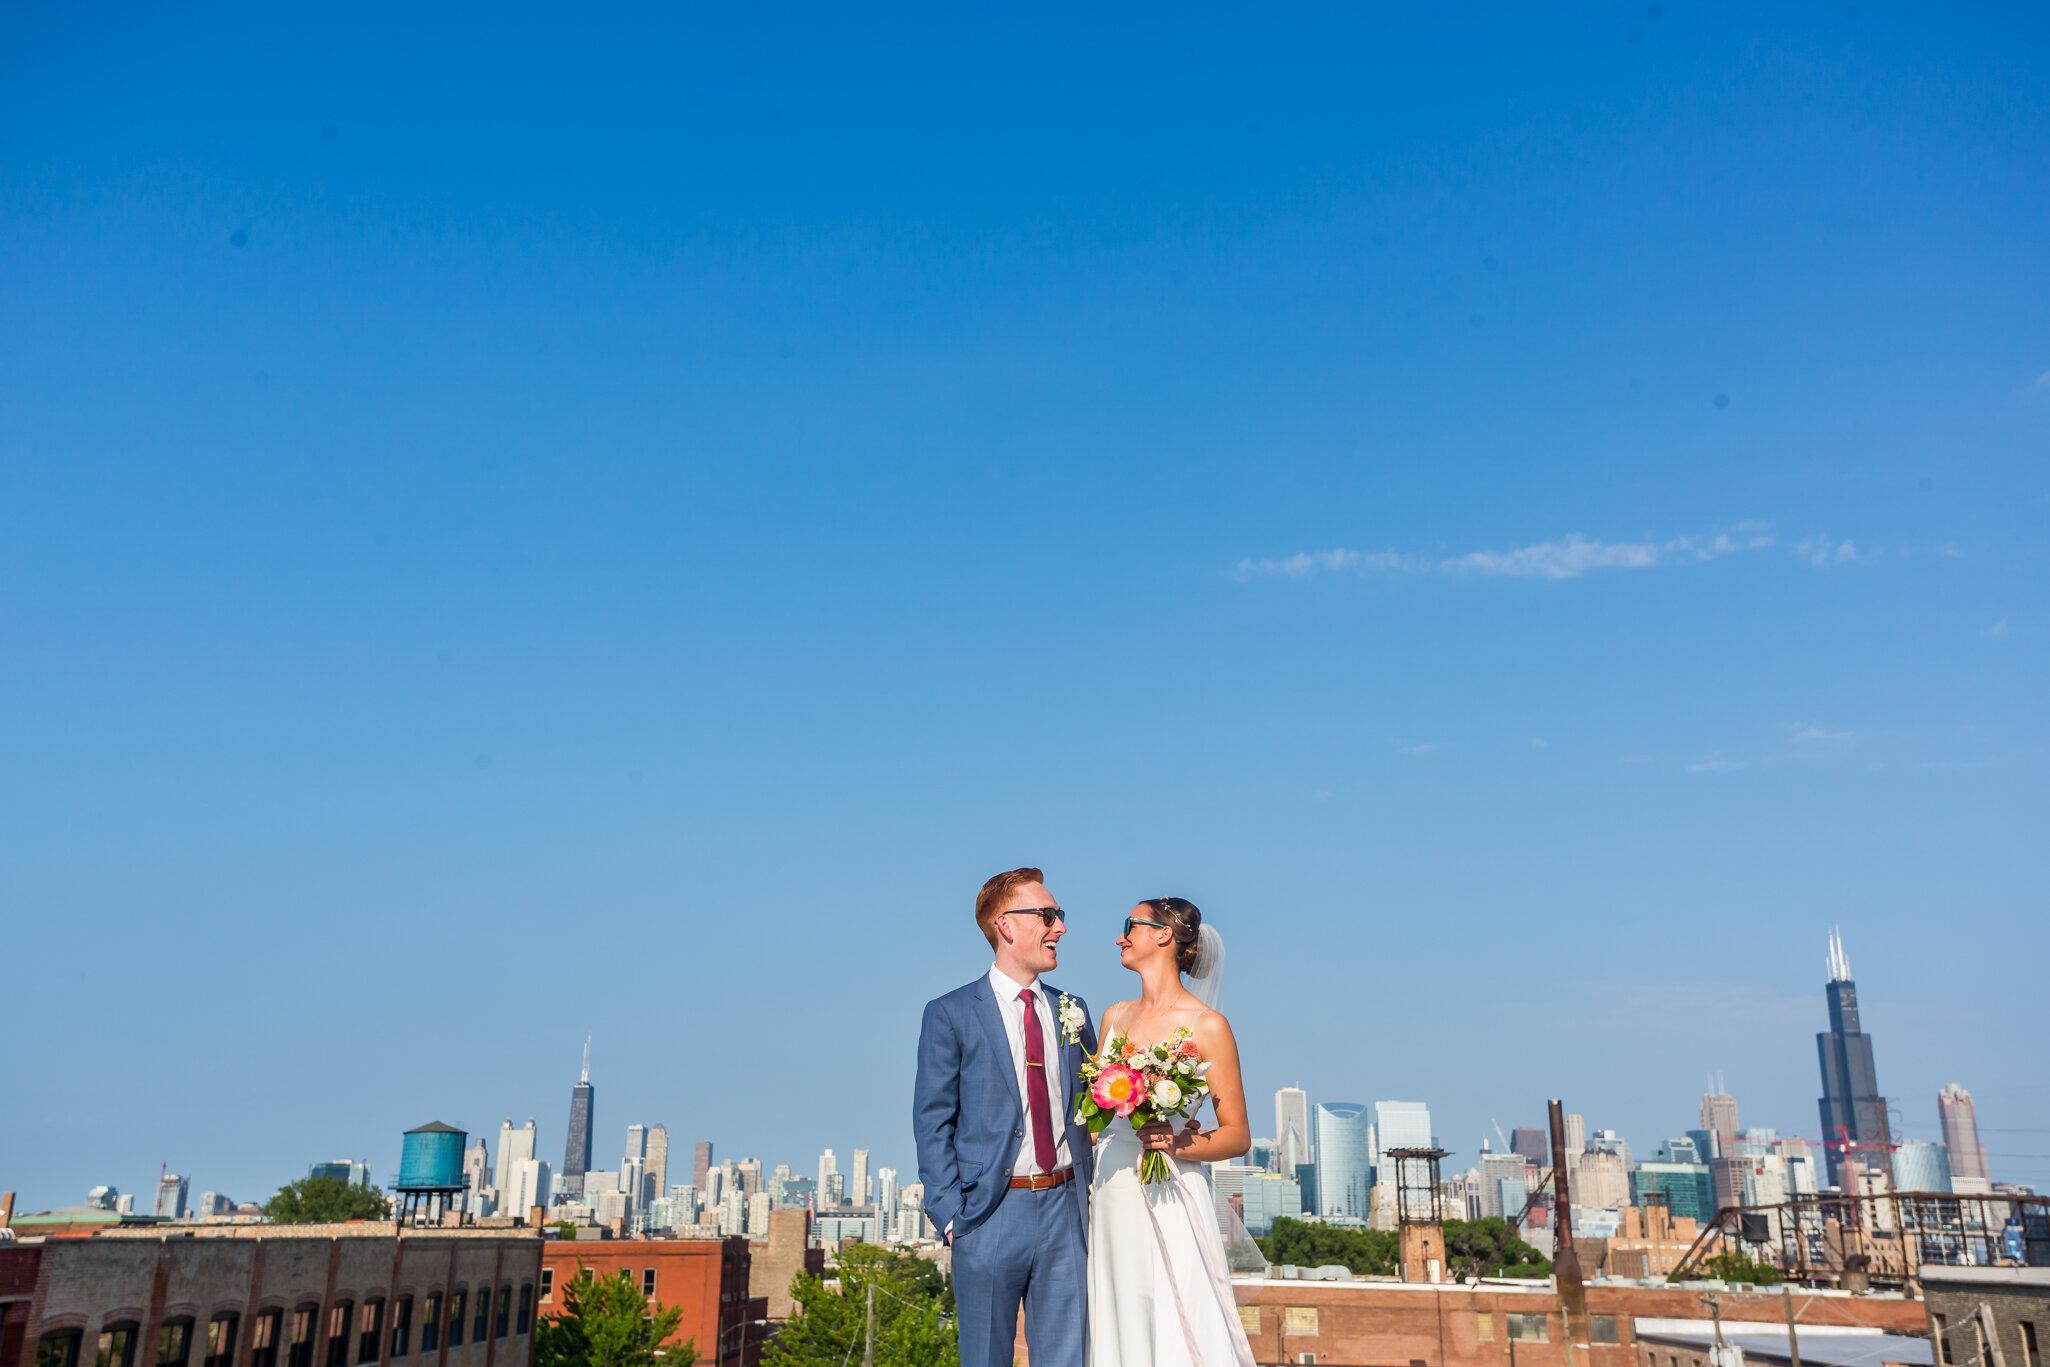 Chicago_Wedding_Photographer_Cross1695.JPG